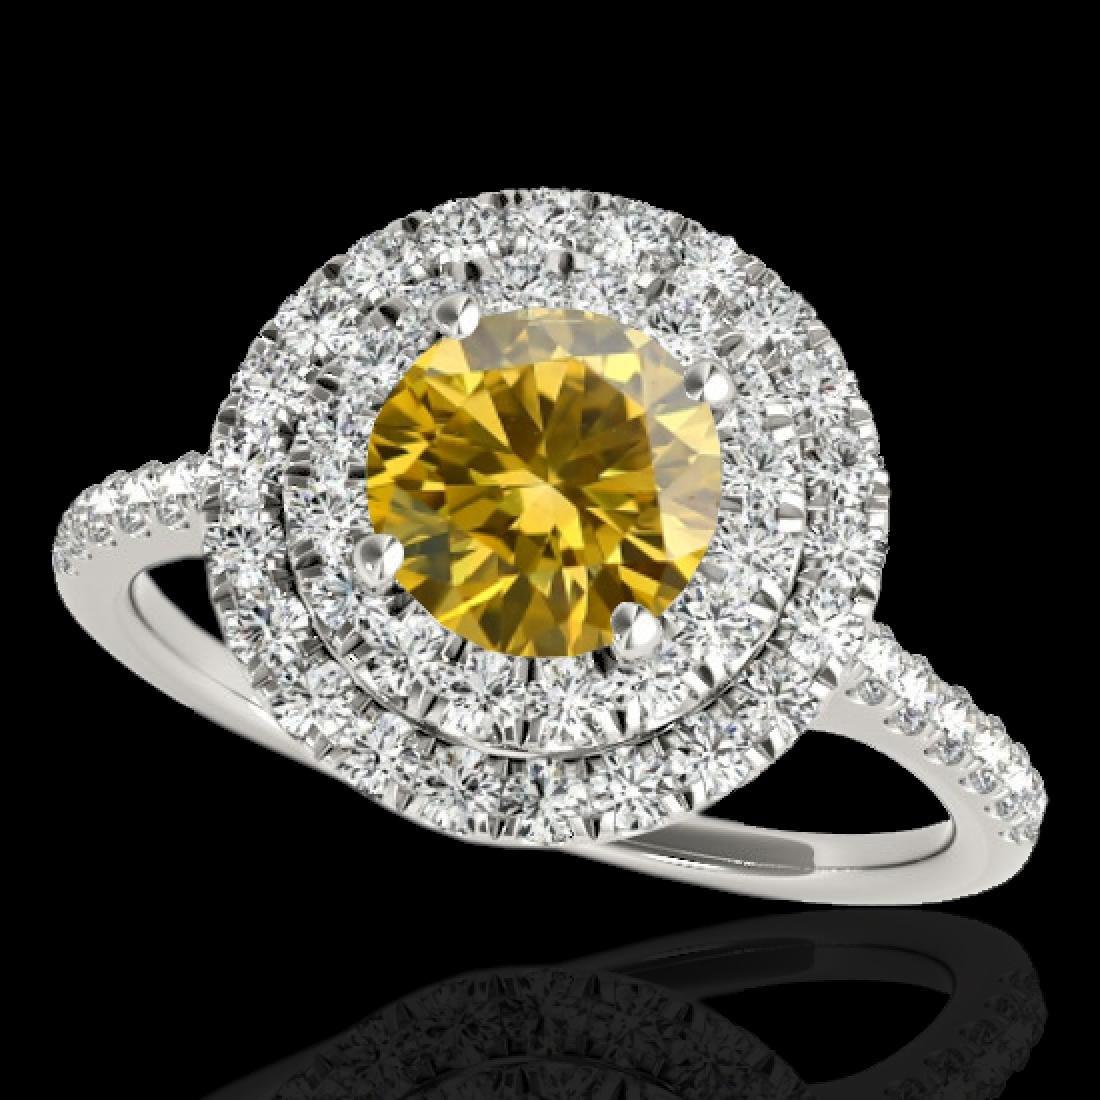 1.5 CTW Certified Si Fancy Intense Diamond Solitaire